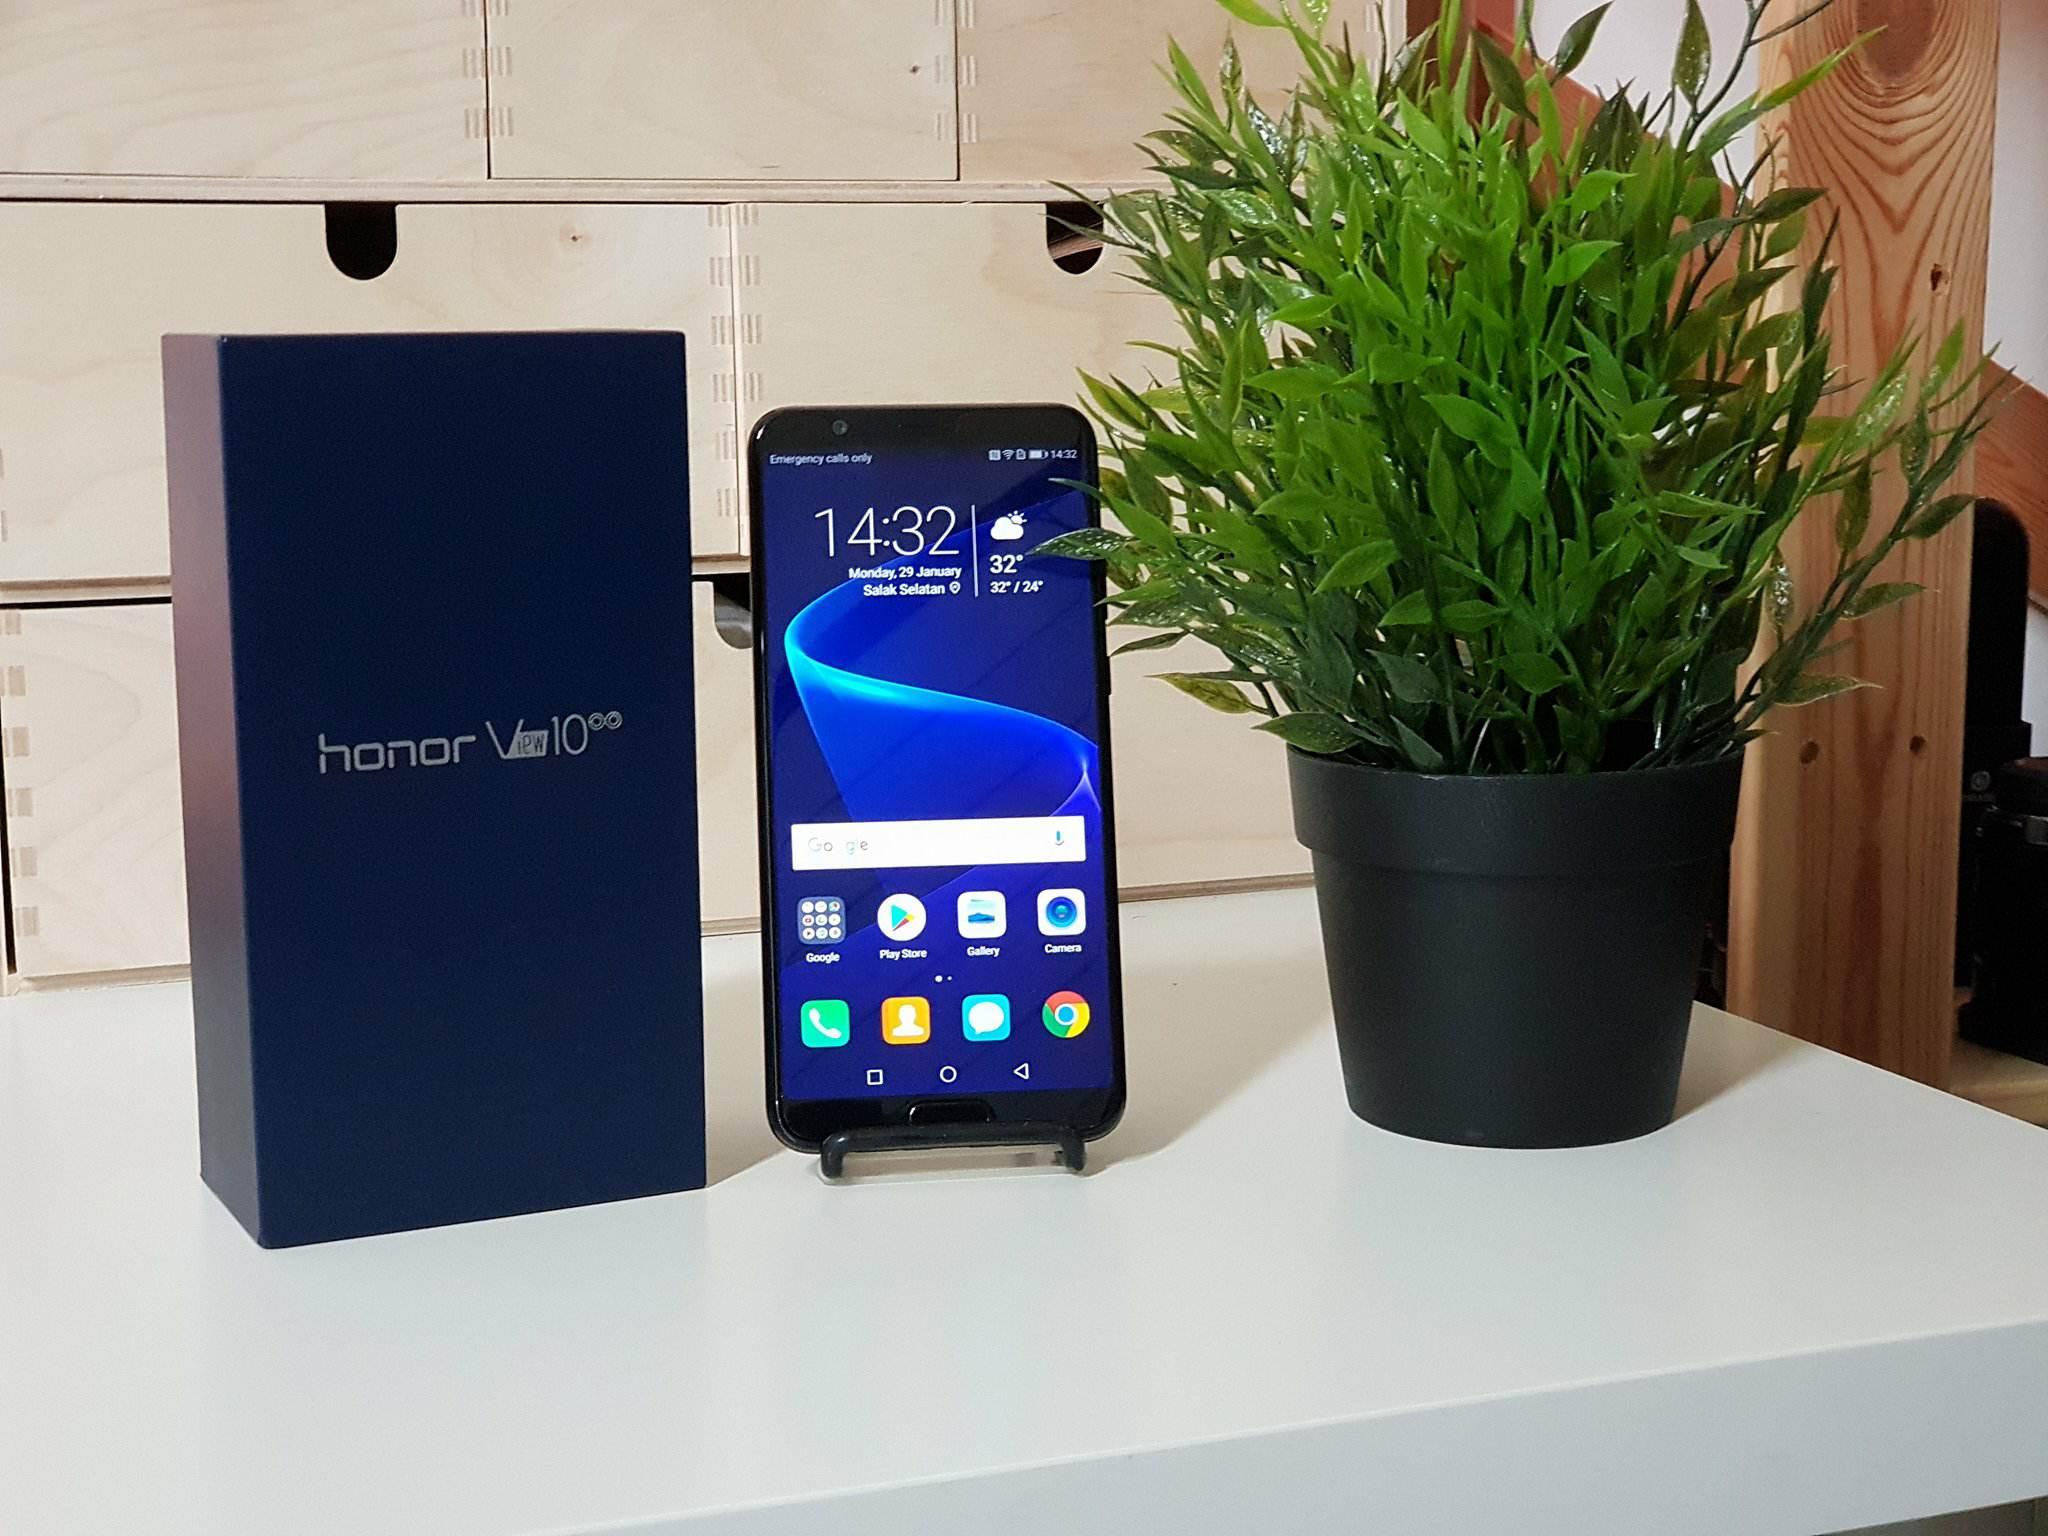 honor View 10测评:性能与相机功能,让它成为目前性价比最均衡的手机!